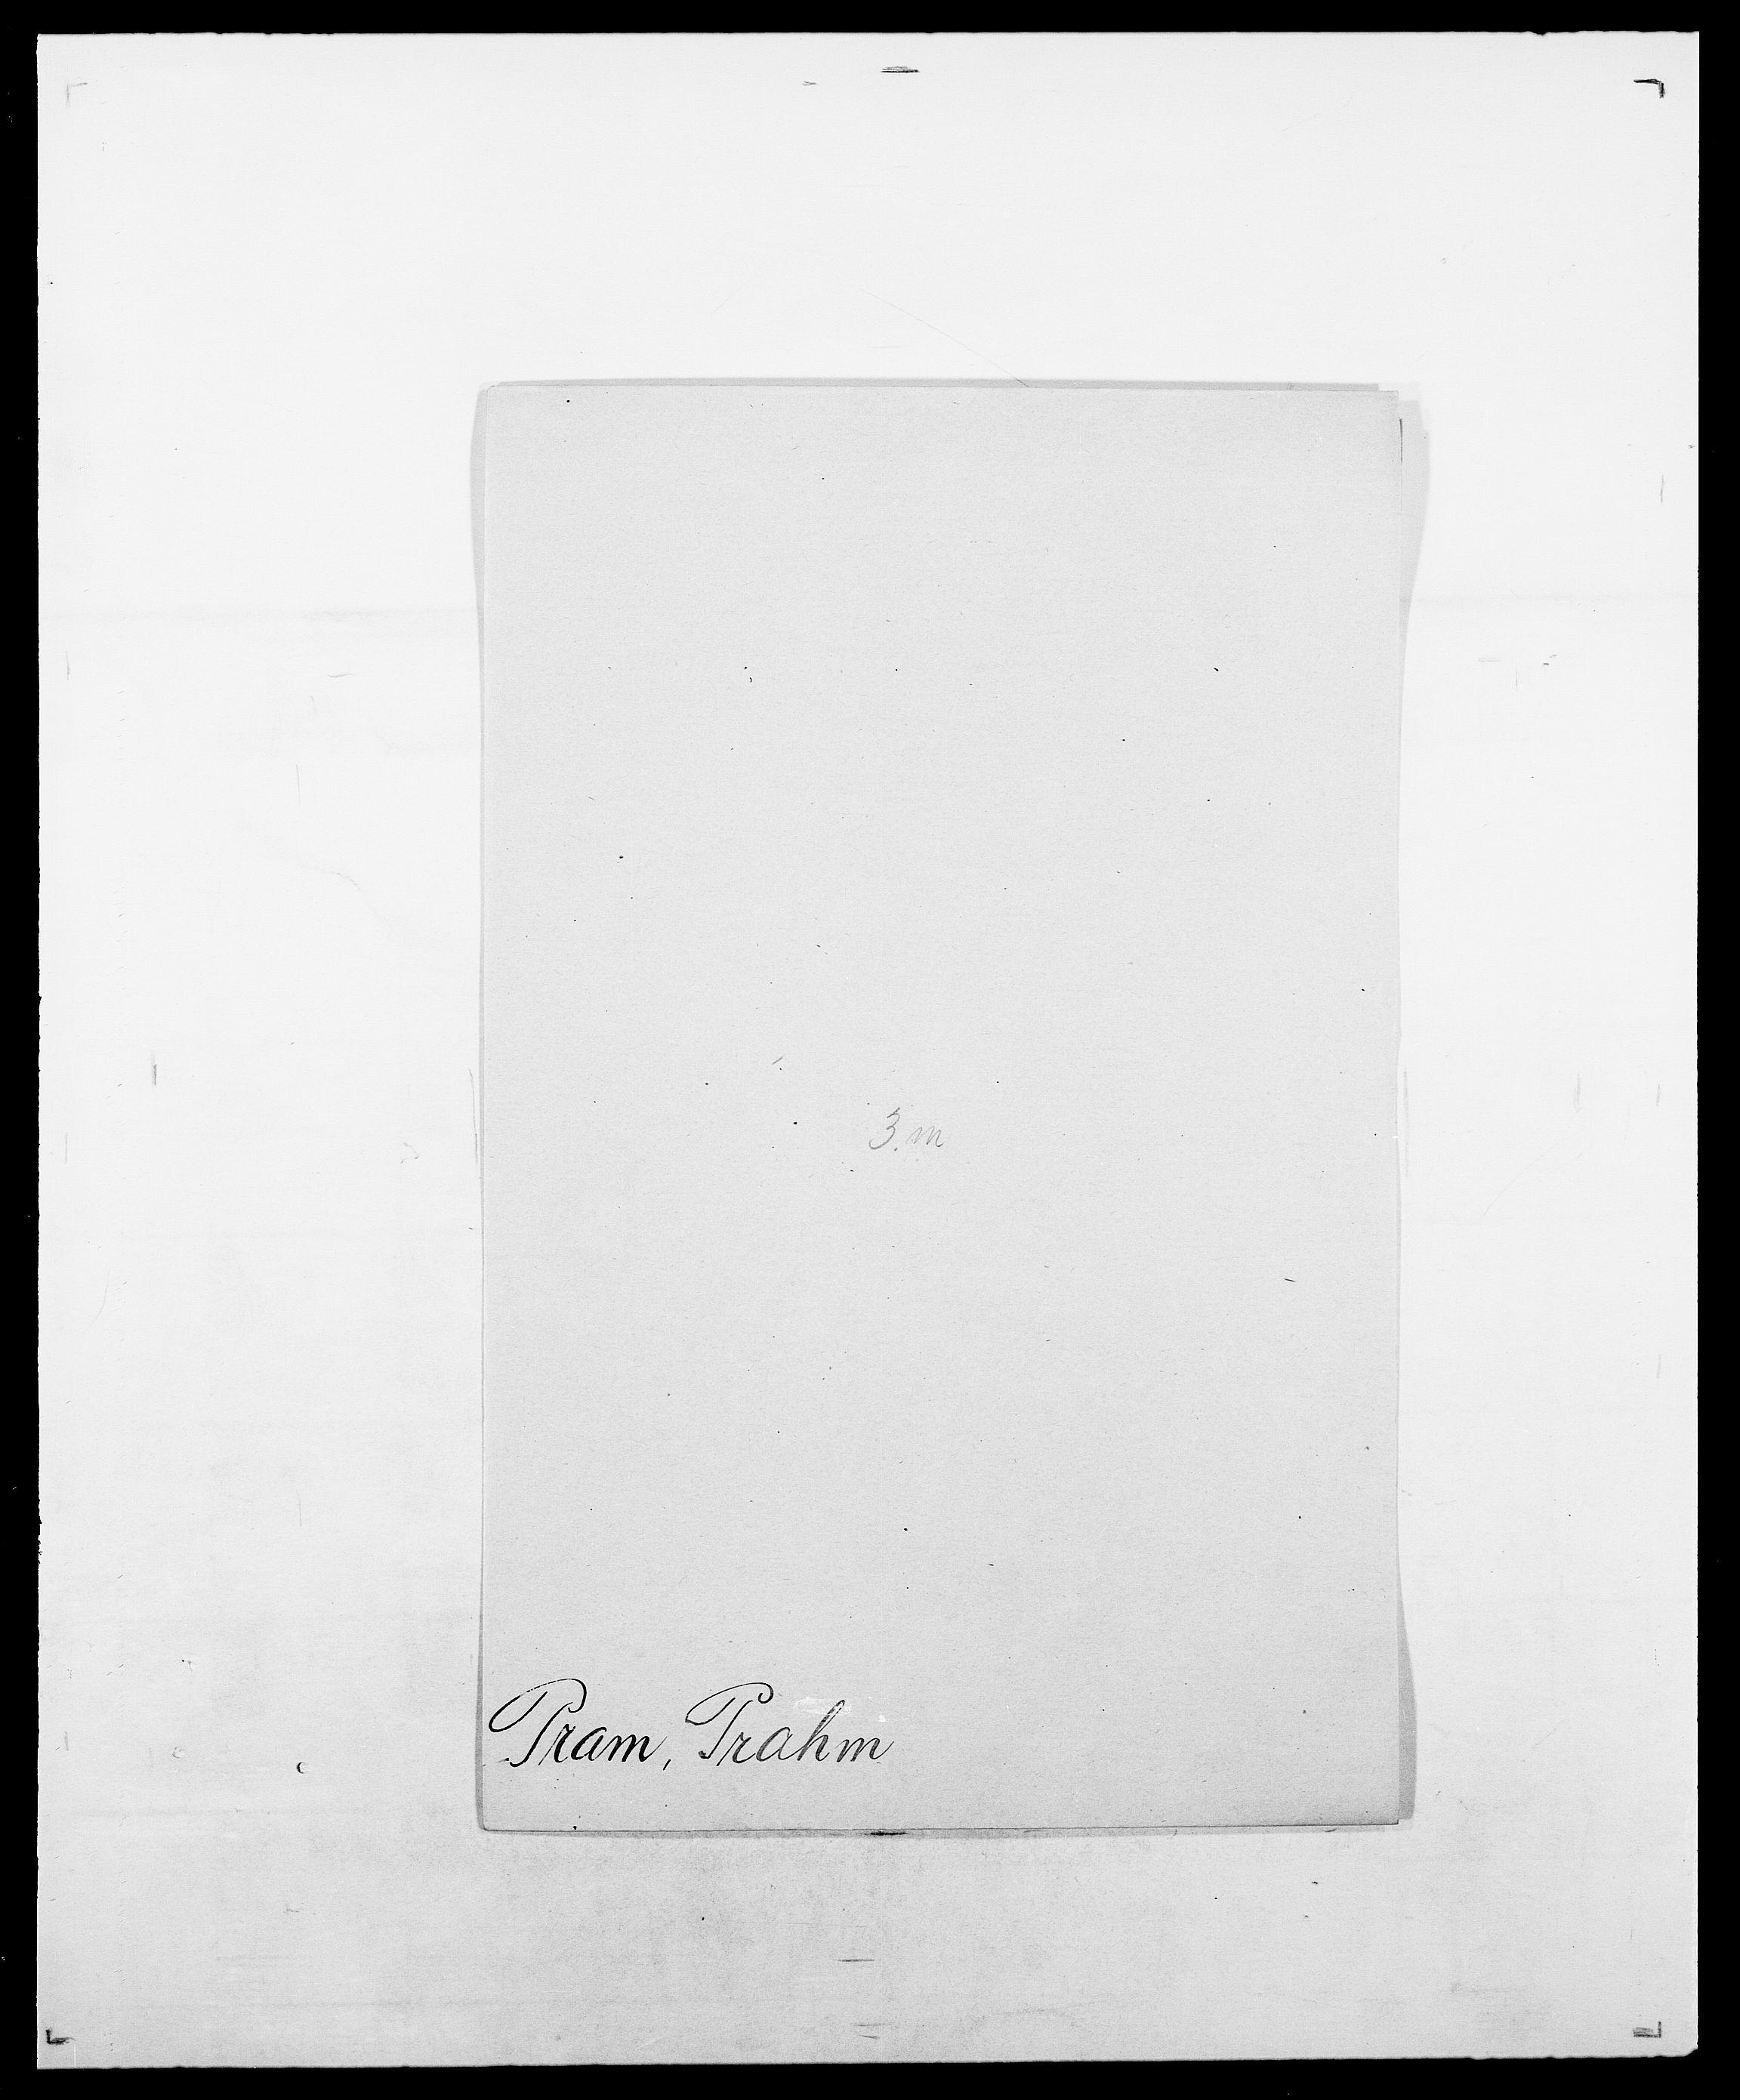 SAO, Delgobe, Charles Antoine - samling, D/Da/L0031: de Place - Raaum, s. 290